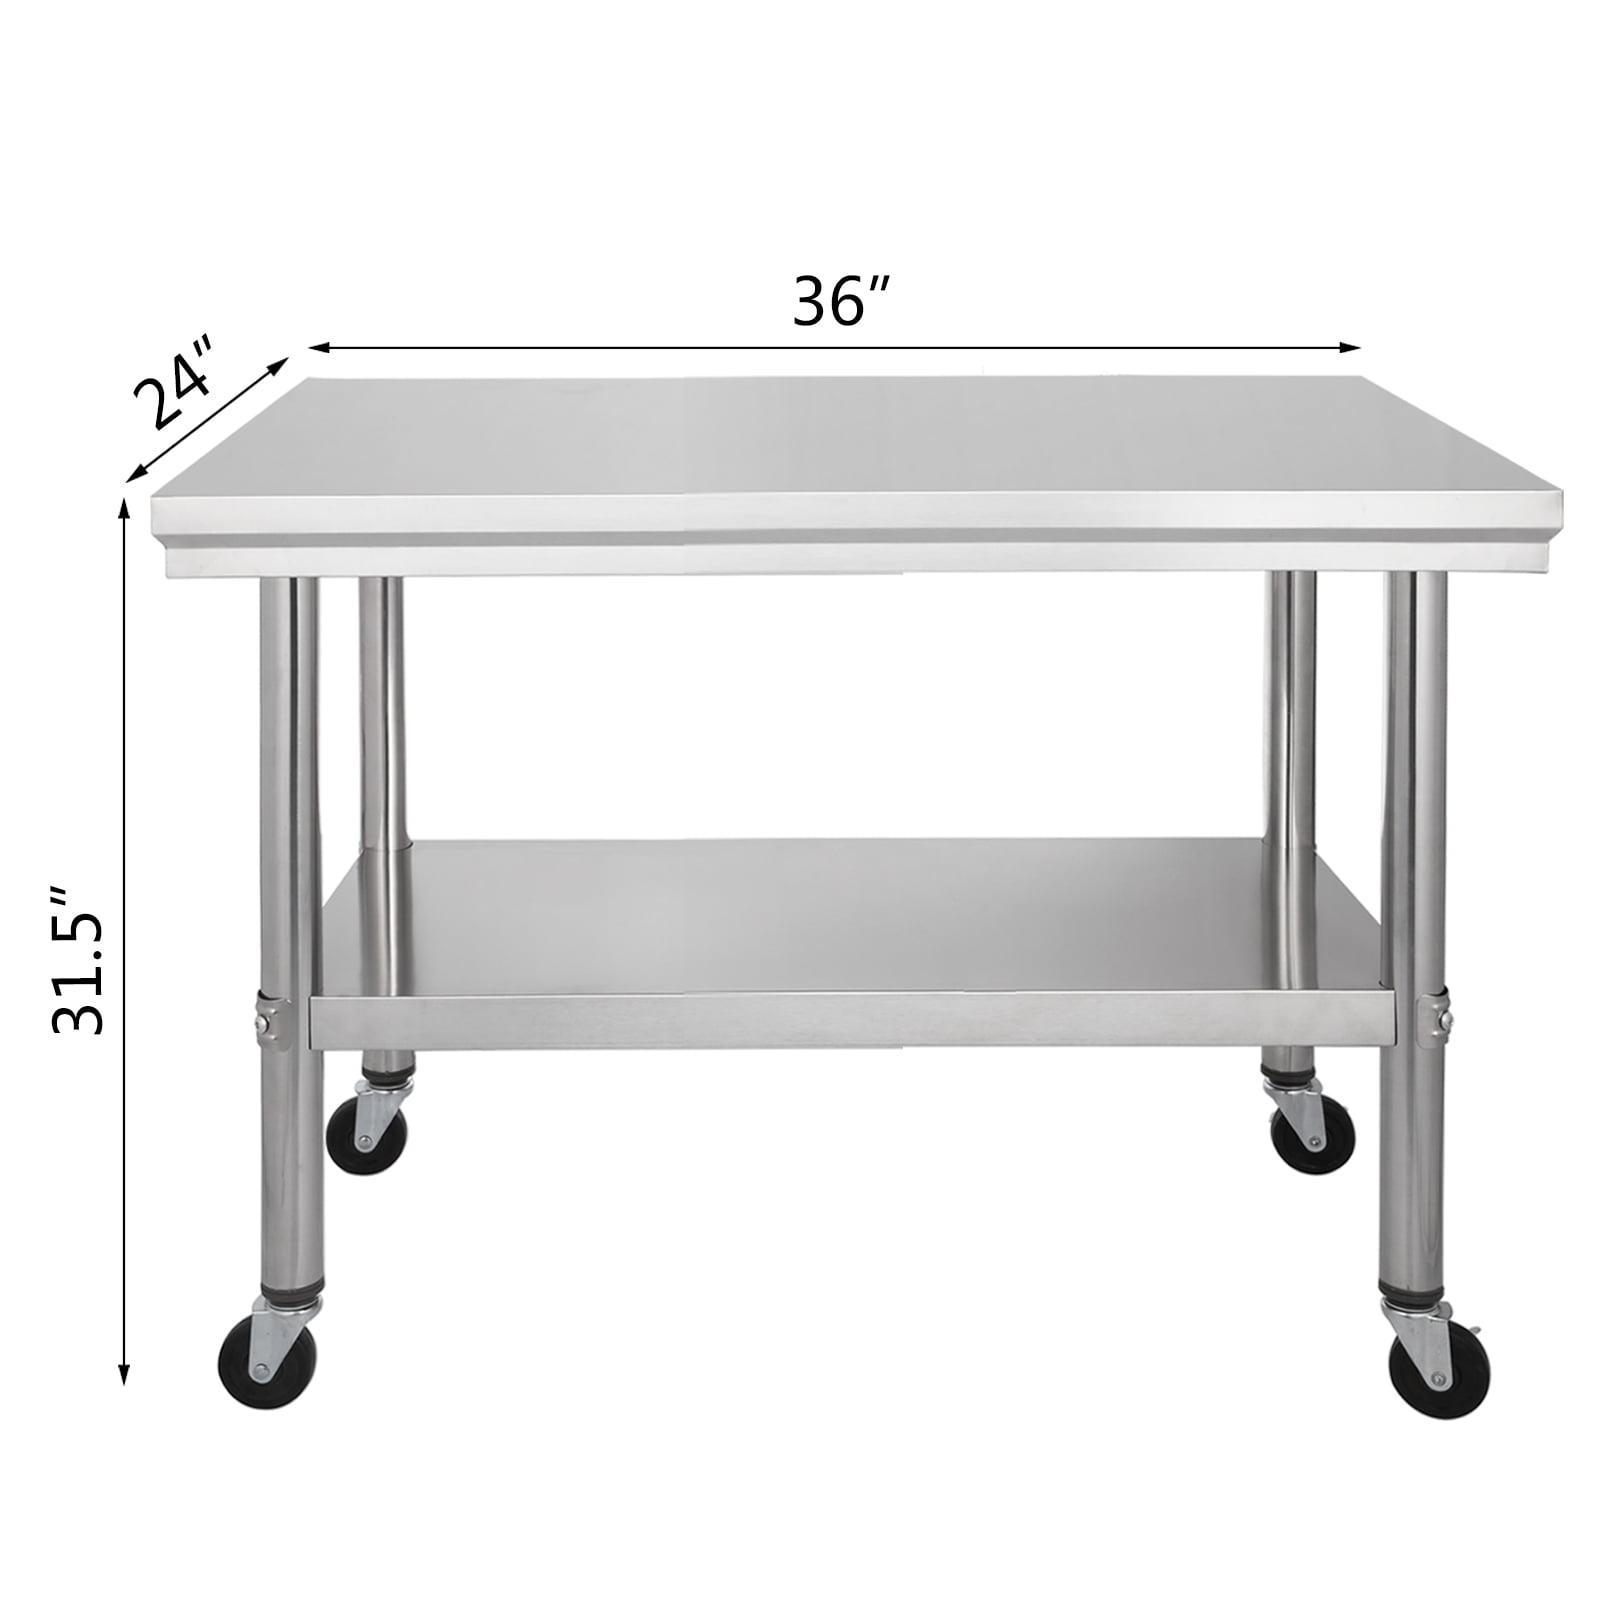 Vevor 36 X24 Work Table Stainless Steel Rolling Kitchen Cart W Casters Shelving Walmart Com Walmart Com